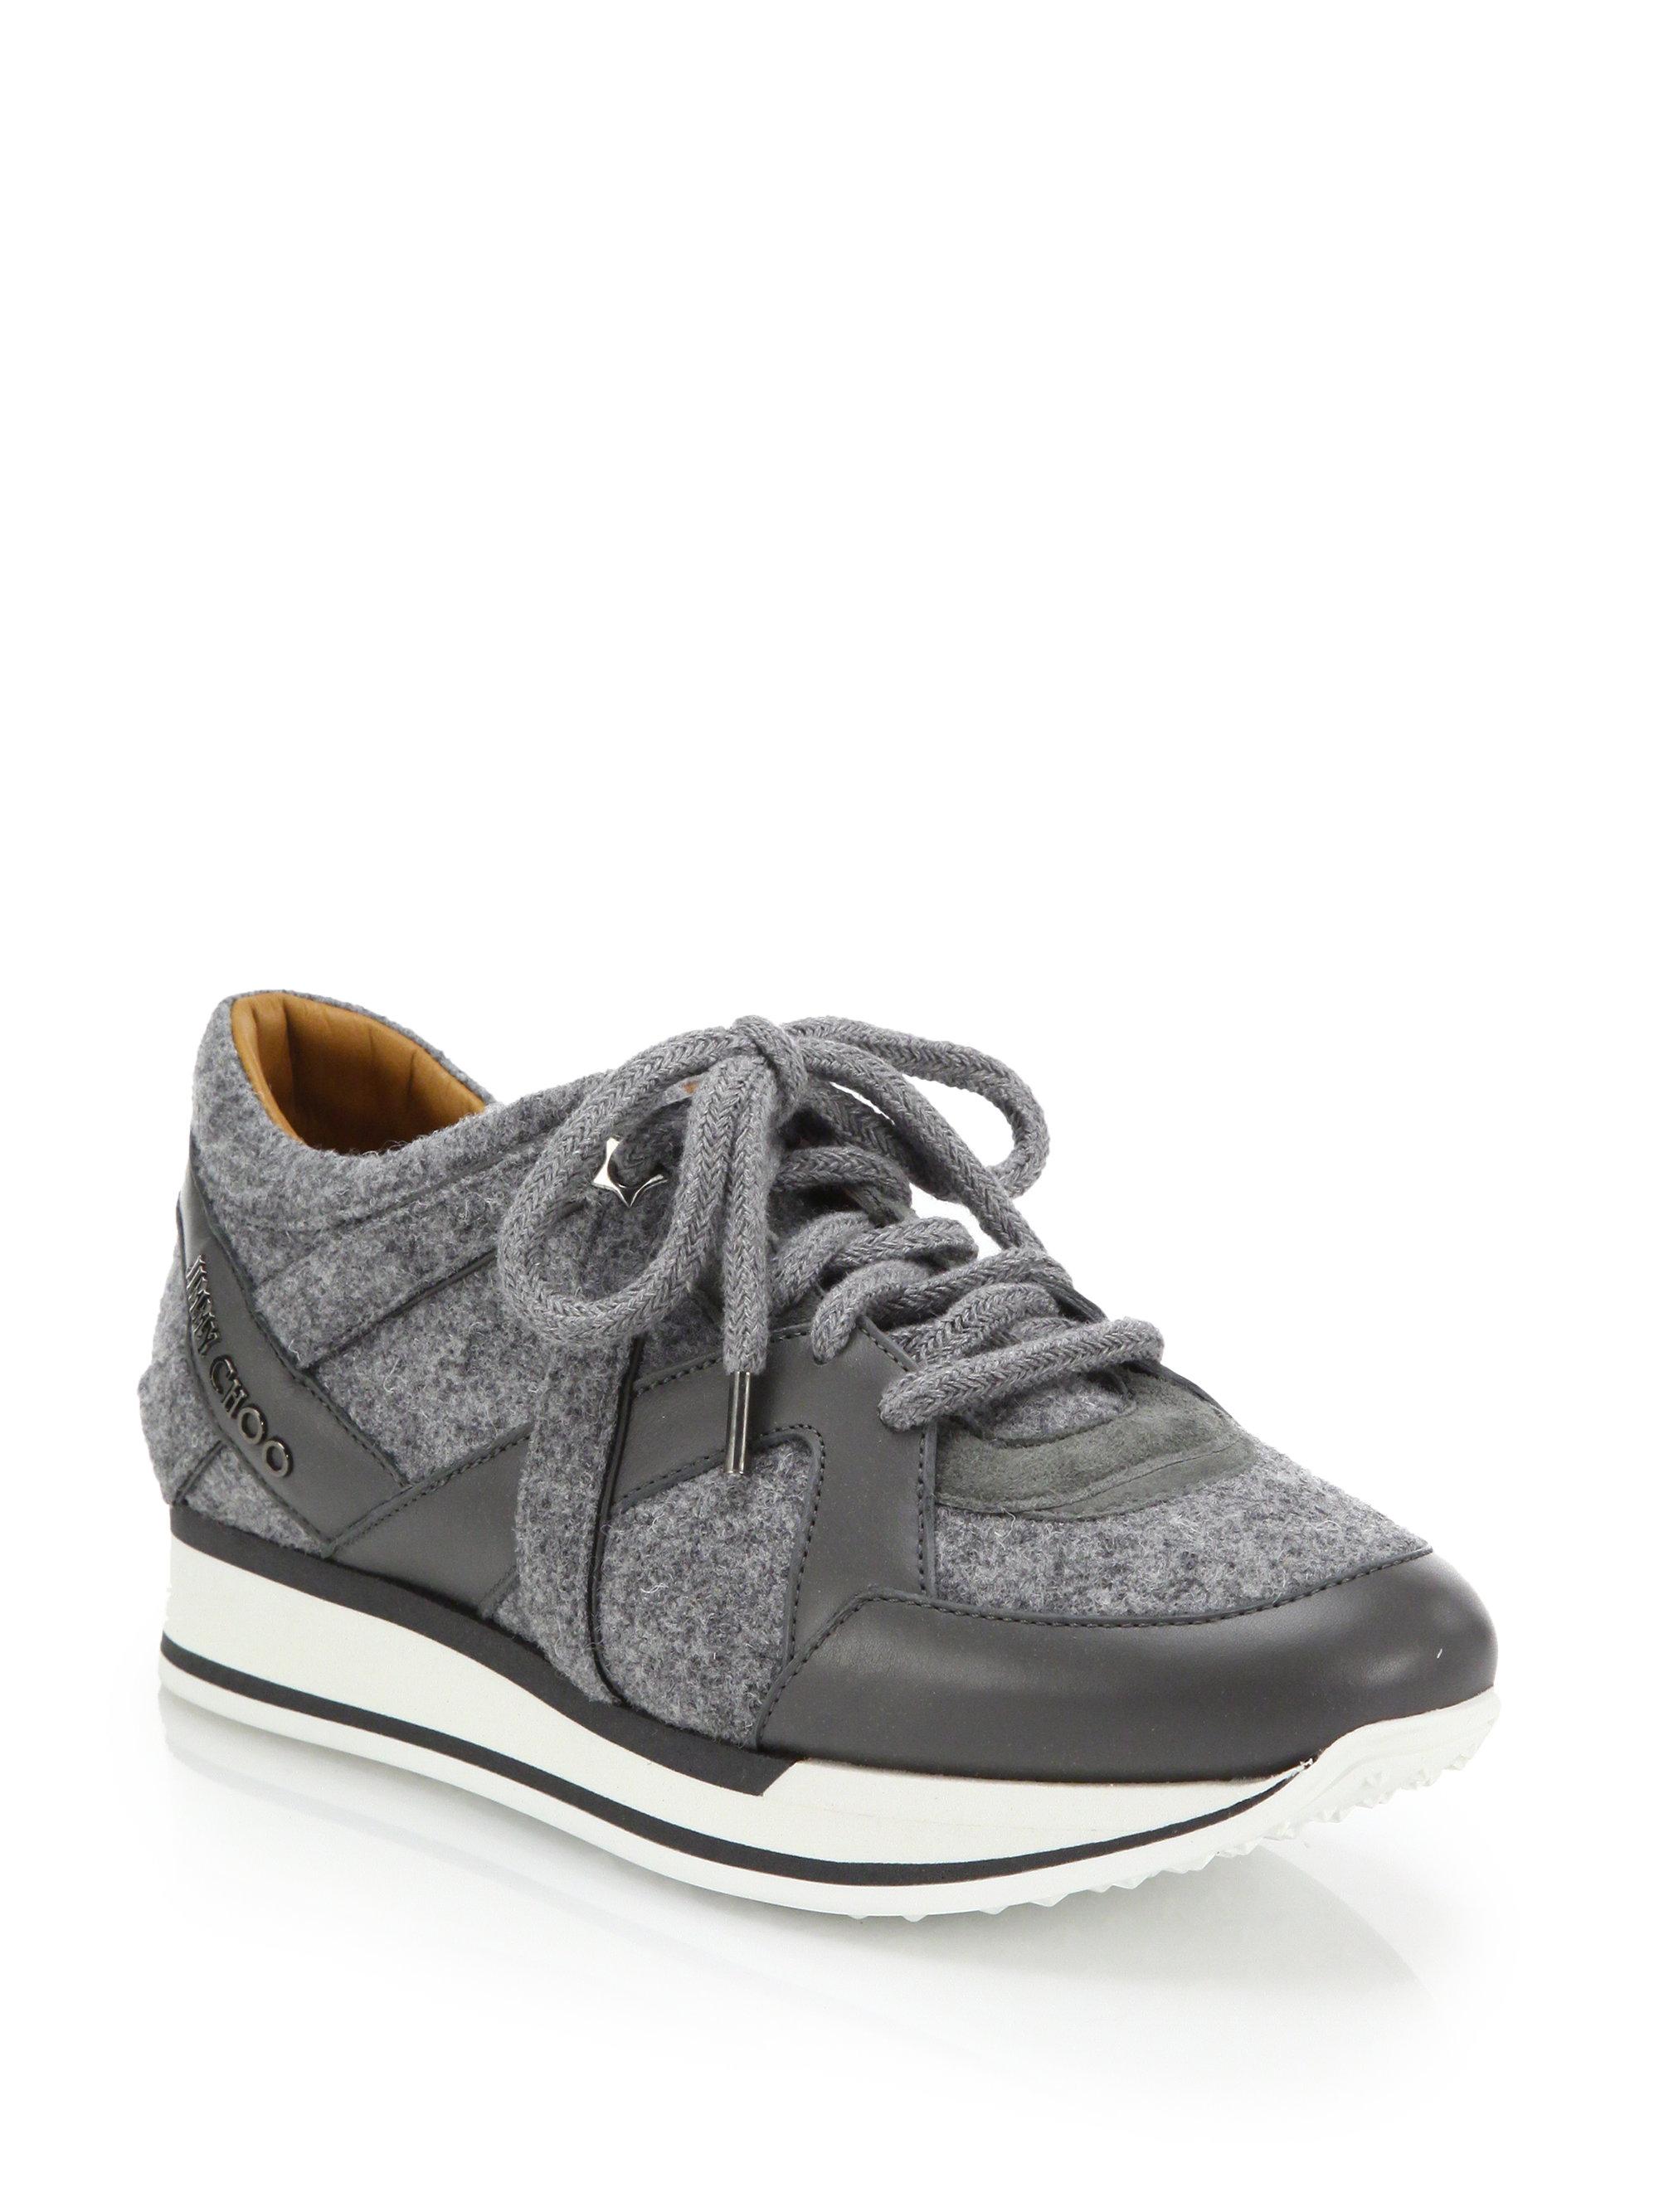 Jett sneakers - White Jimmy Choo London DMpggM